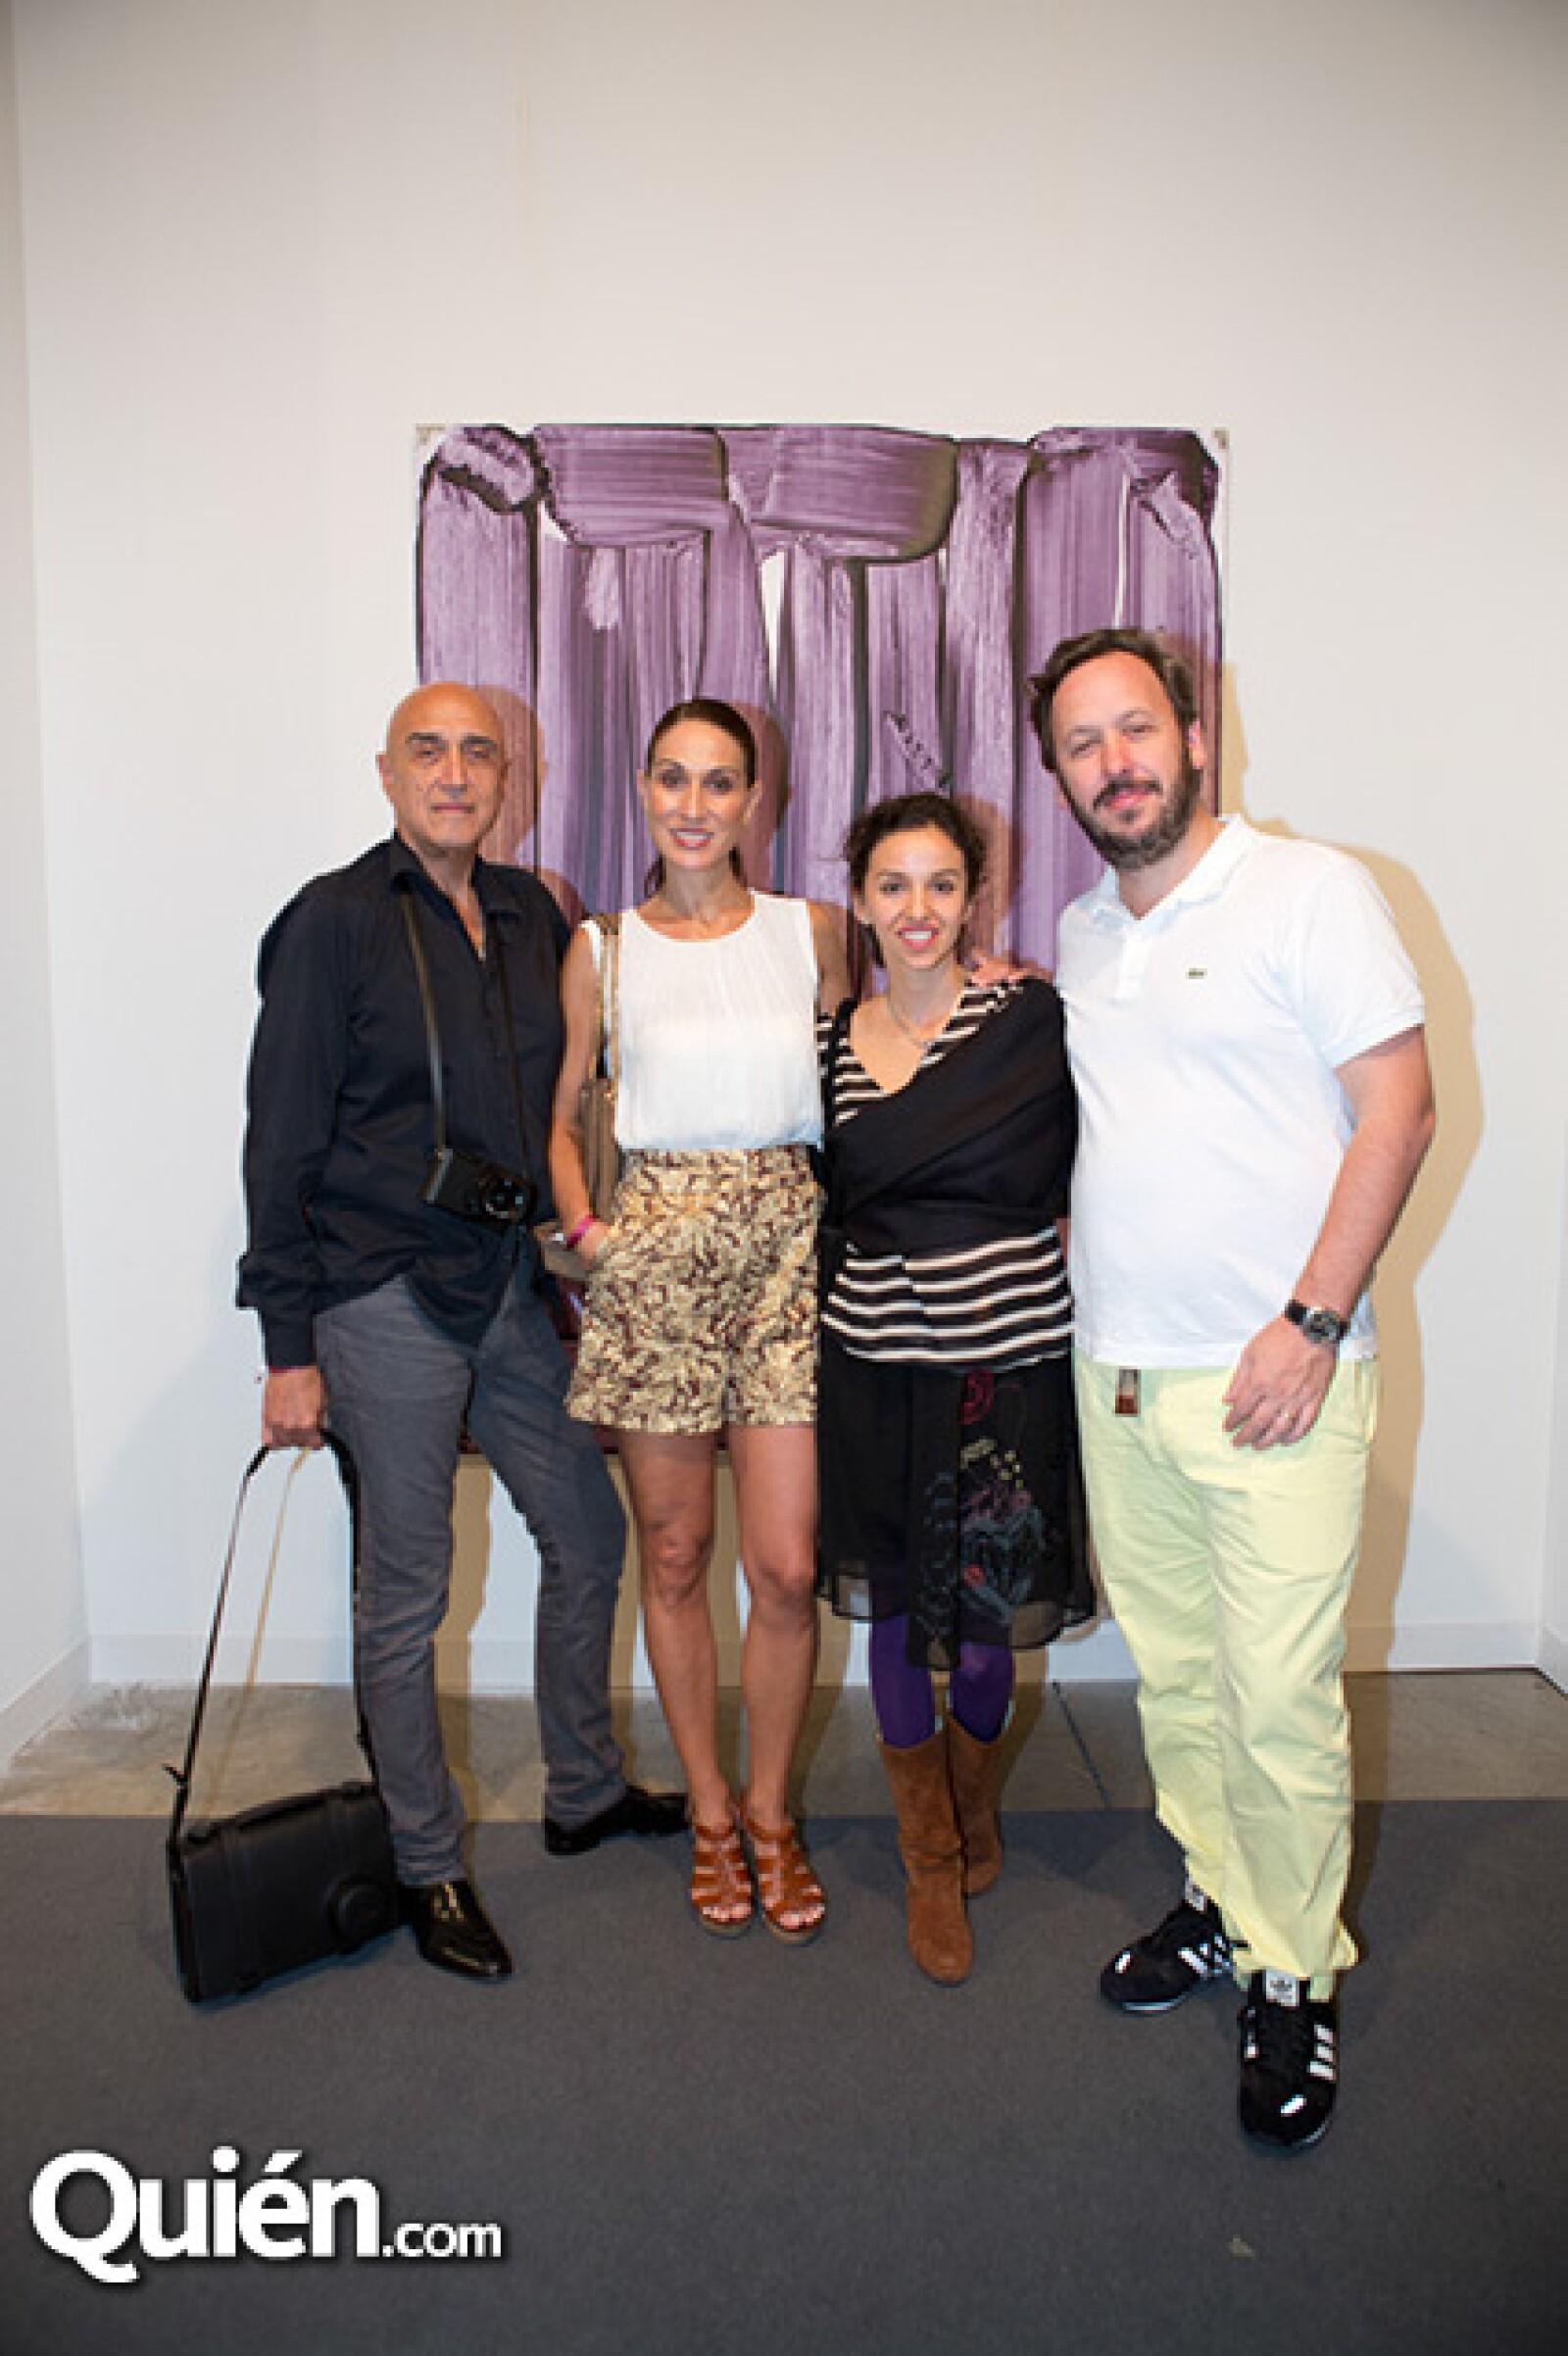 Pedro Torres,Roberta López Negrete,Alejandra Berrone,Leandro Berrone